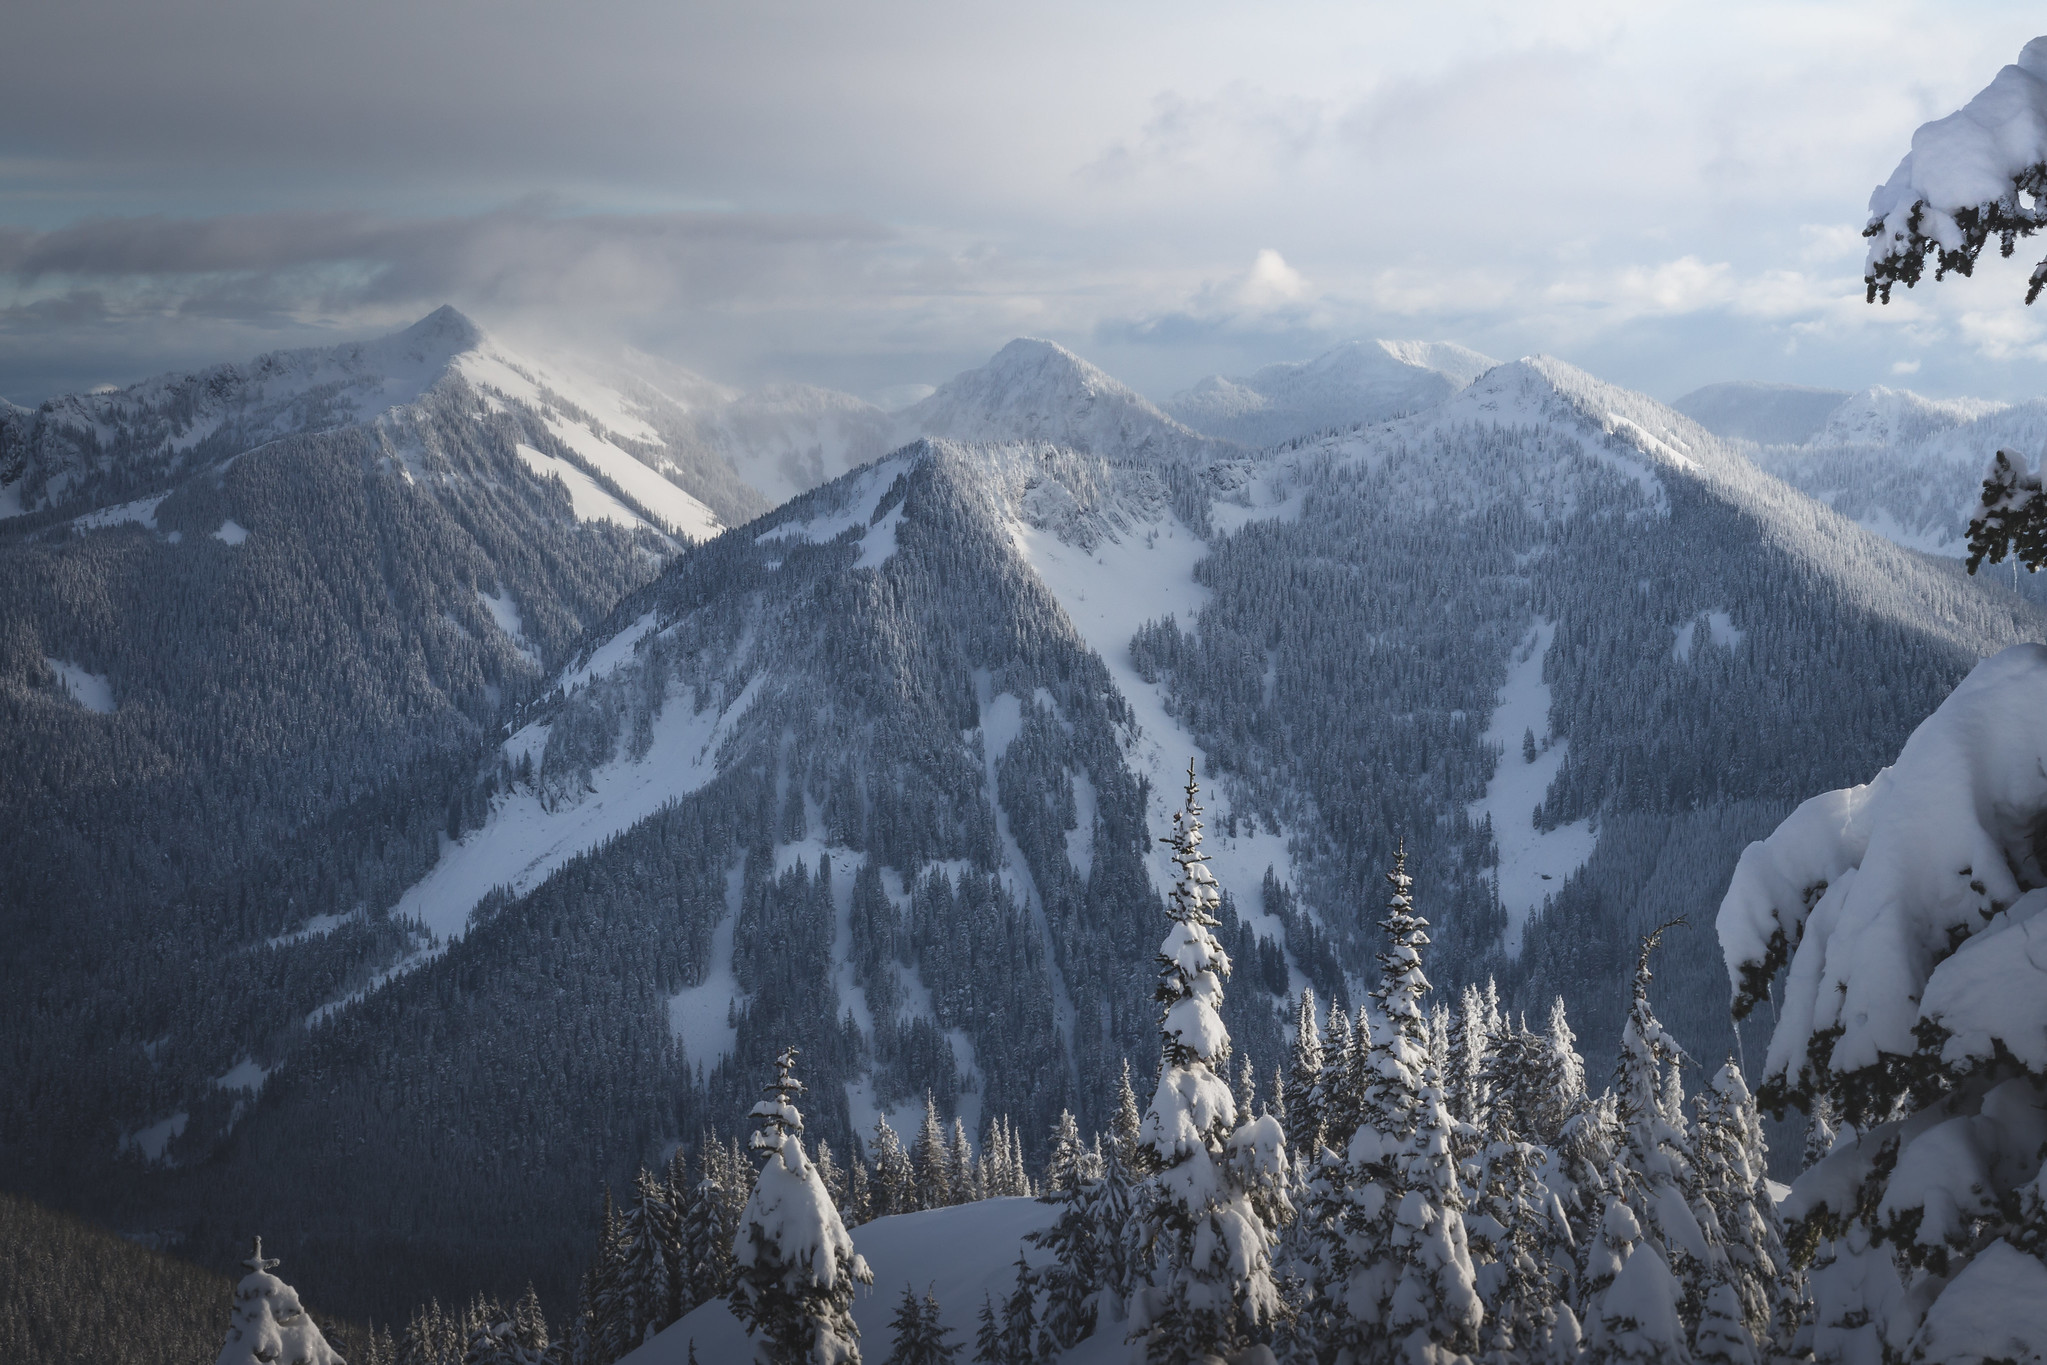 Silver Peak, Abiel Peak, Humpback Mountain